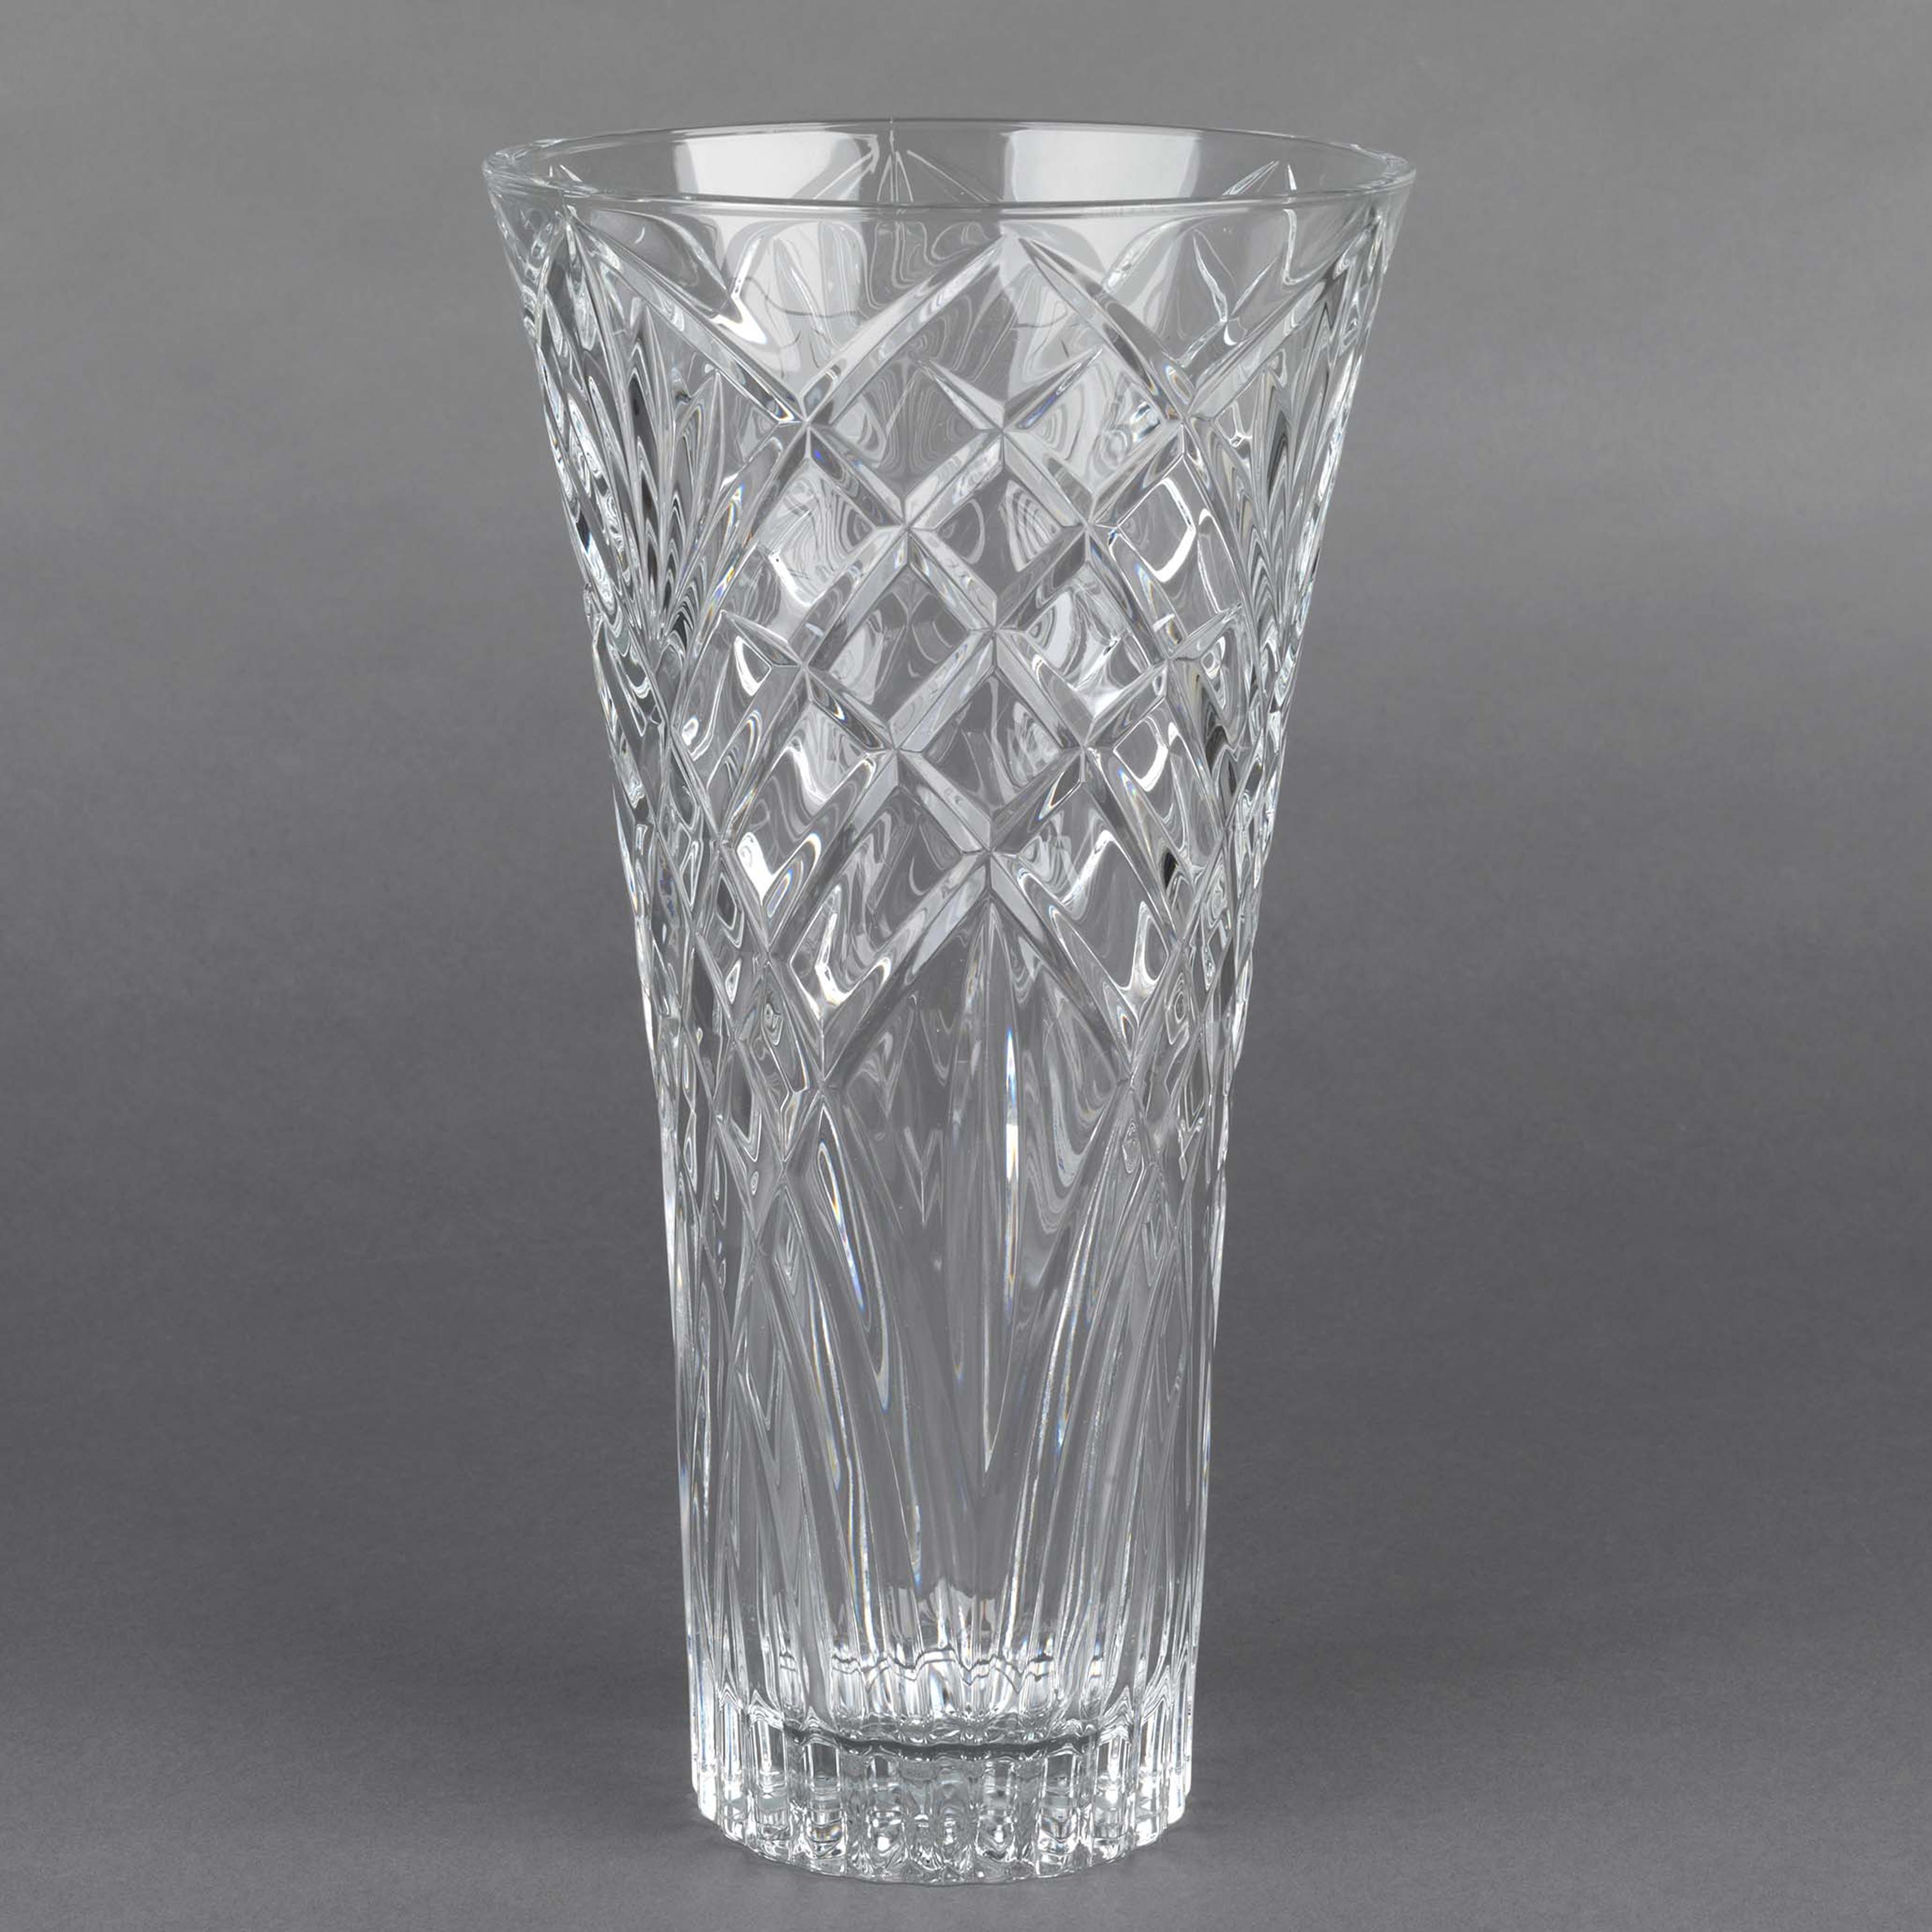 rcr crystal vase price of rcr 25616020006 melodia crystal flower vase 30 cm crystalware pertaining to rcr 25616020006 melodia crystal flower vase 30 cm